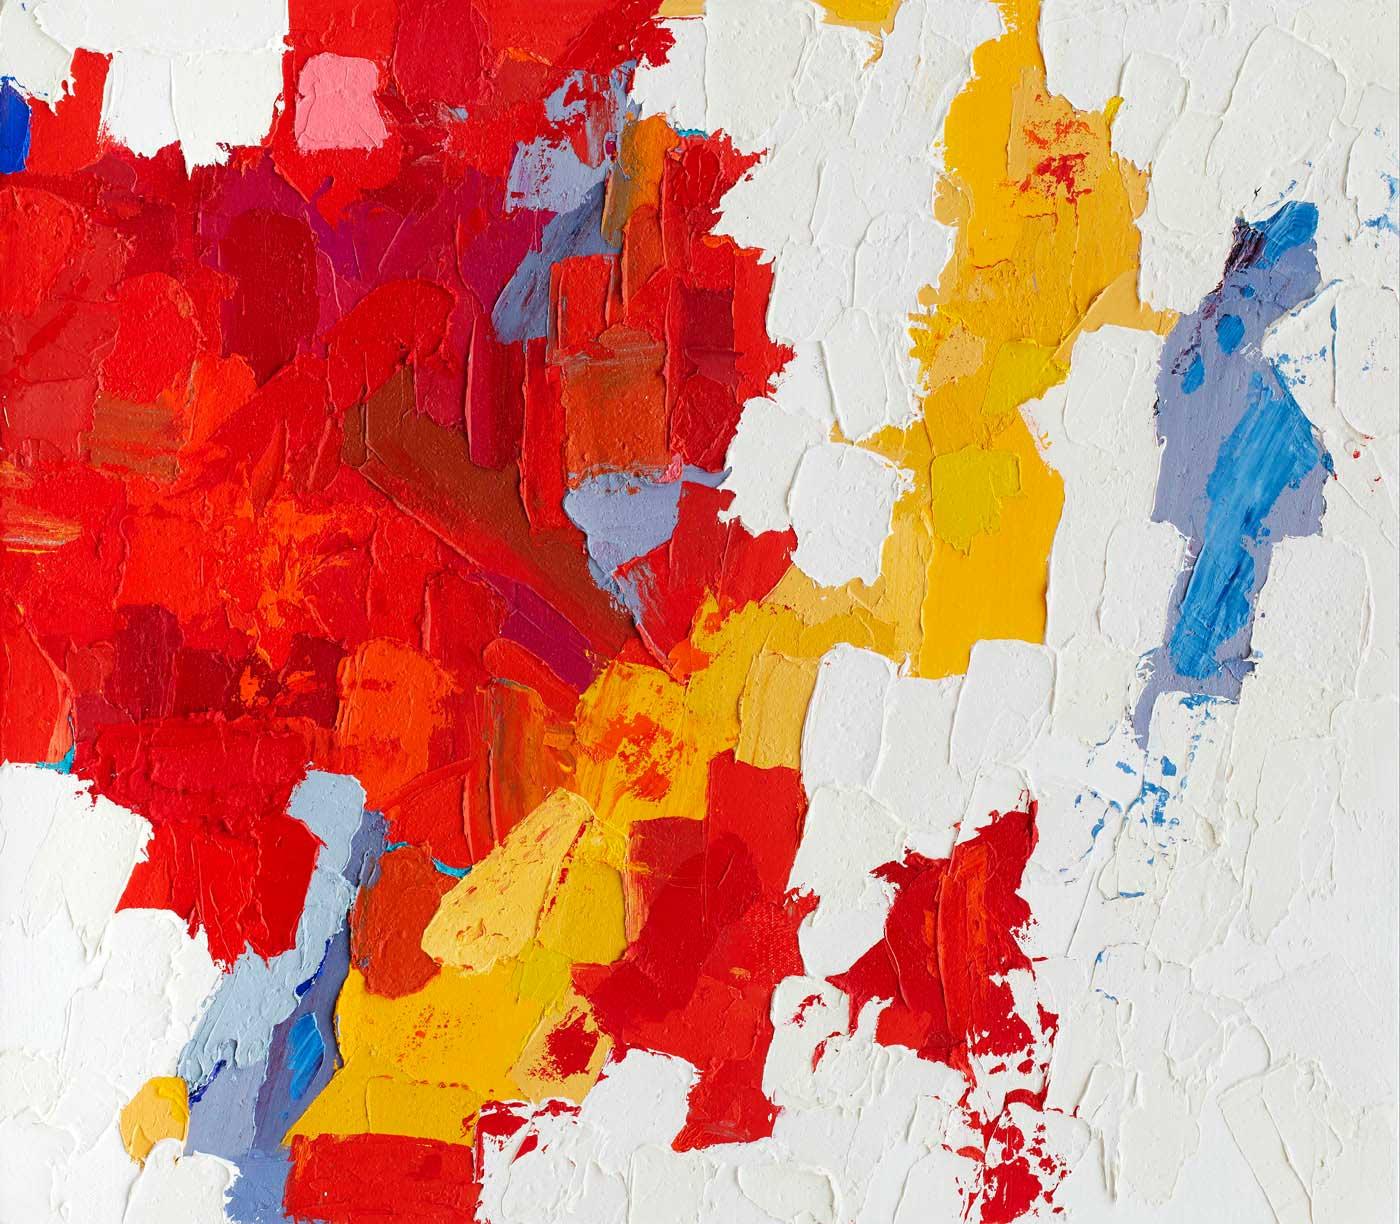 Jessamyn Kahn - Experiment in Thick Paint 2